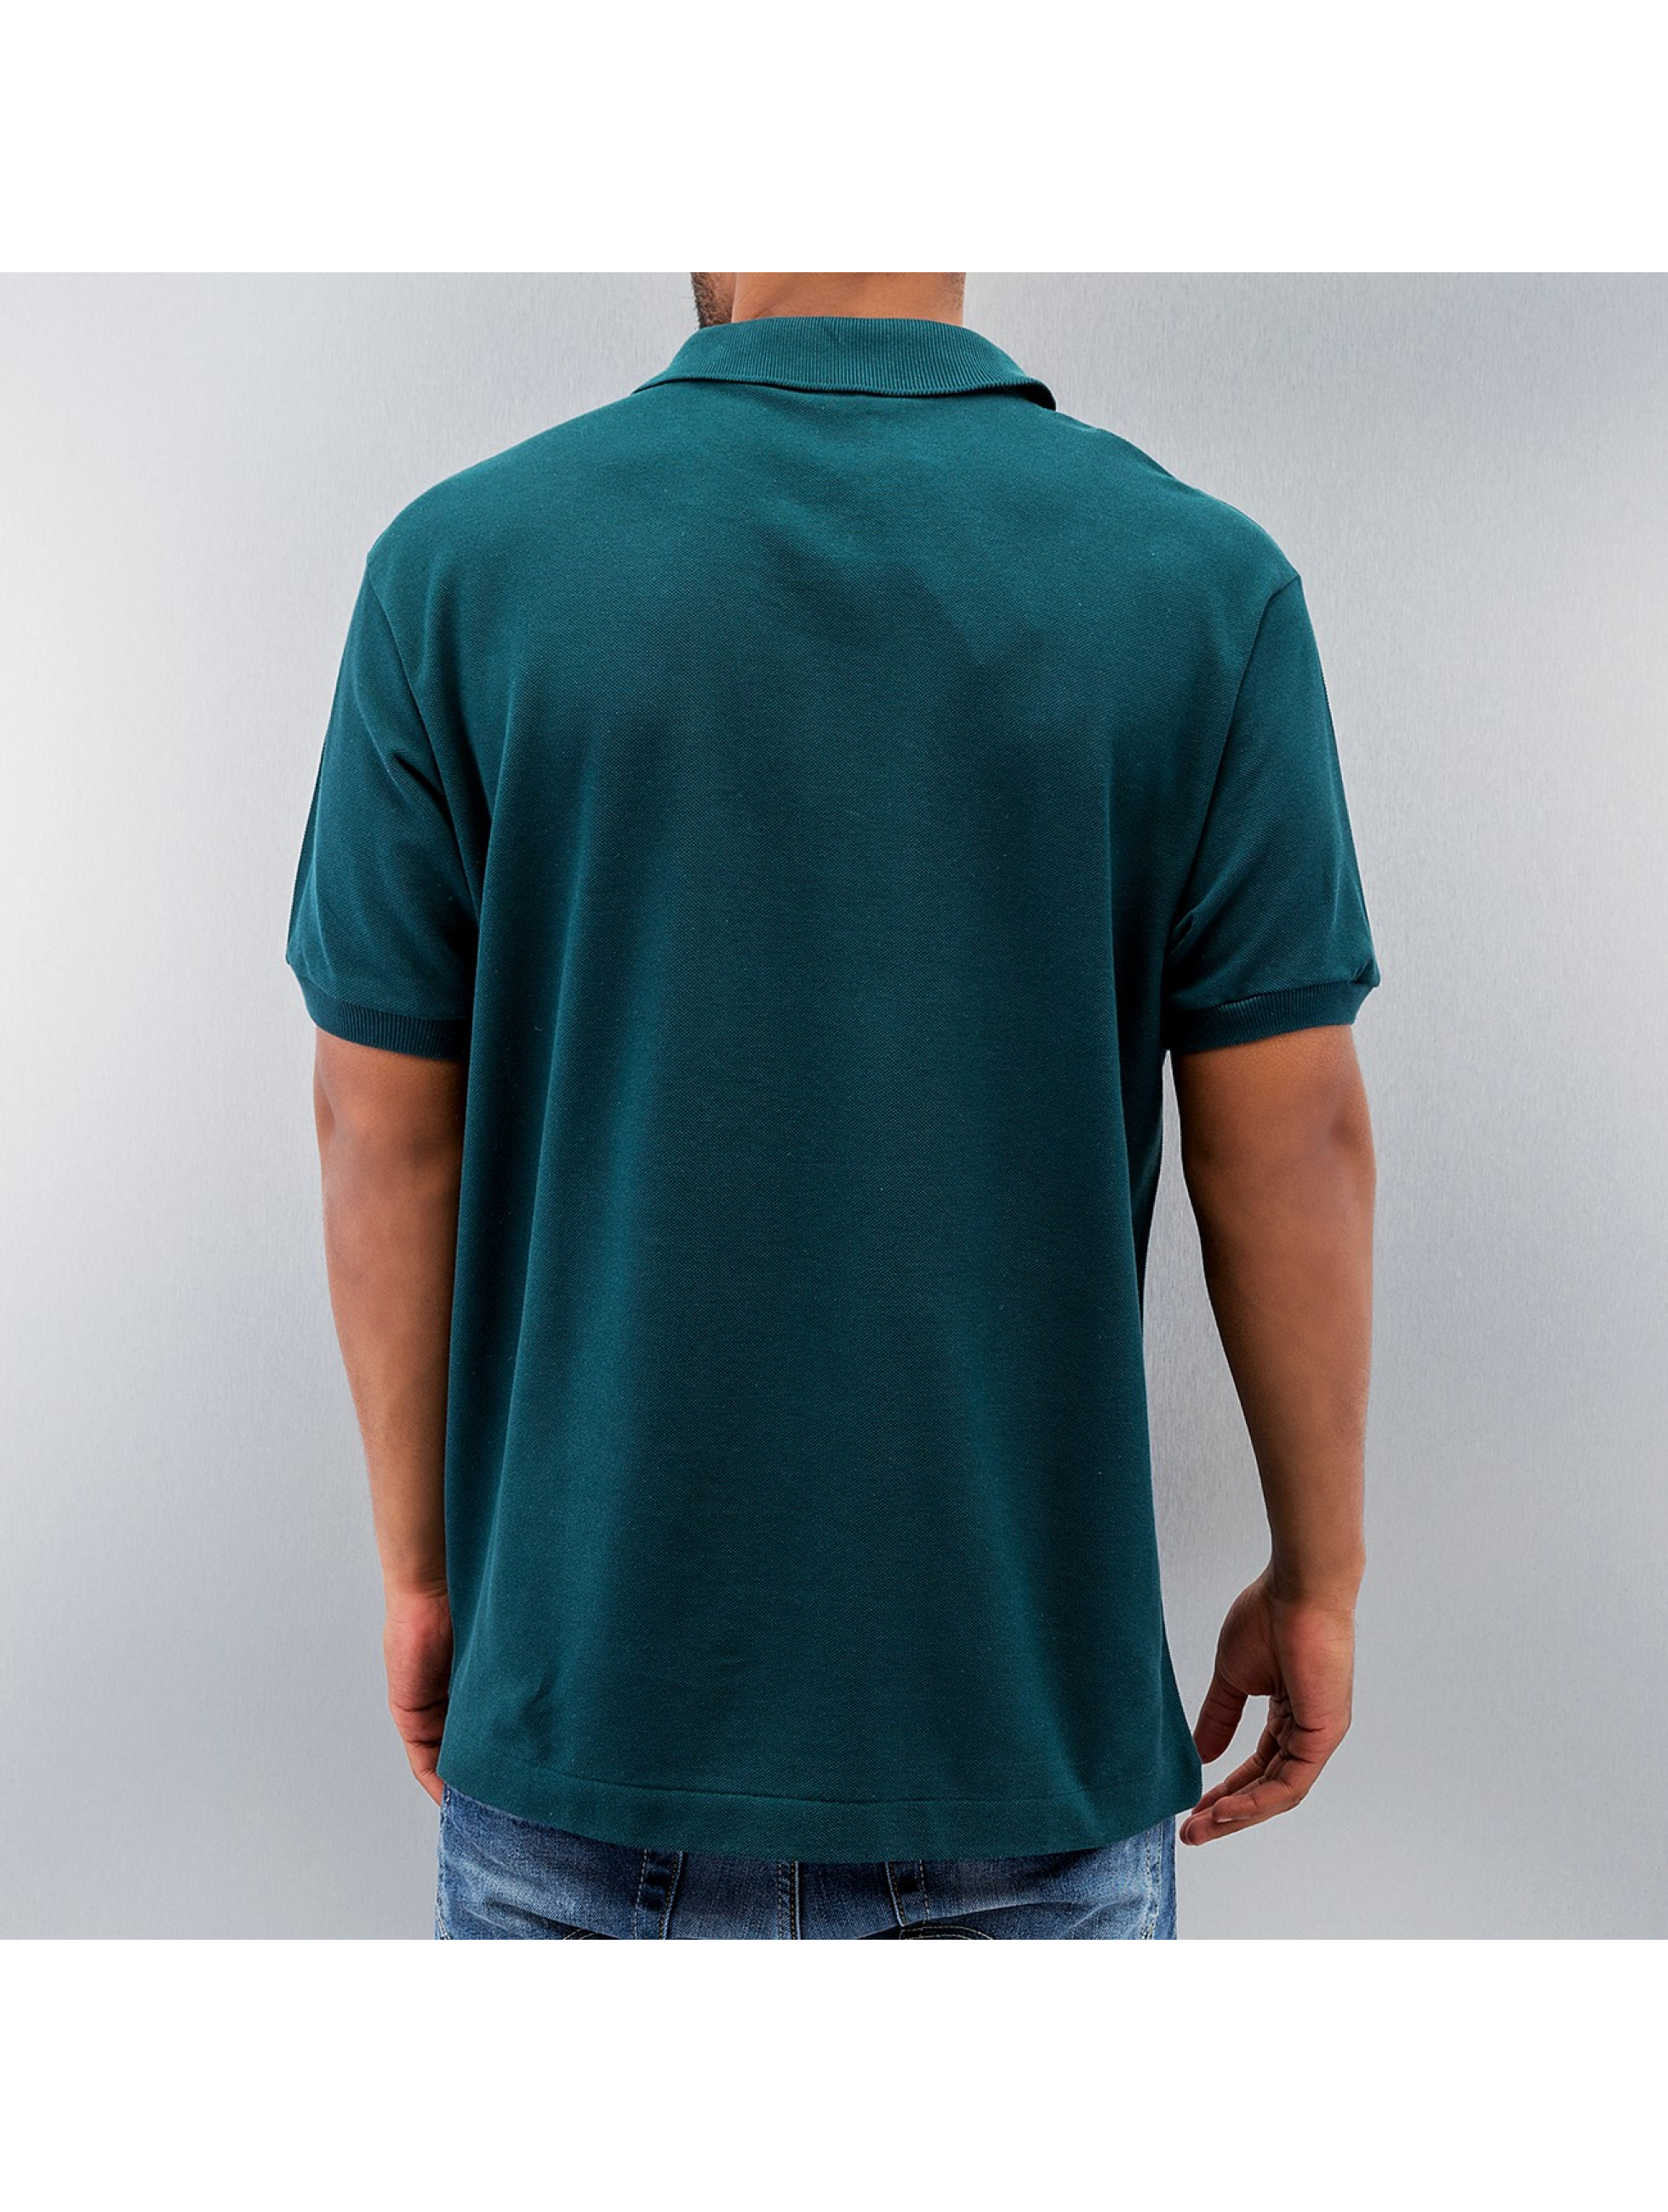 Lacoste Classic poloshirt Basic groen